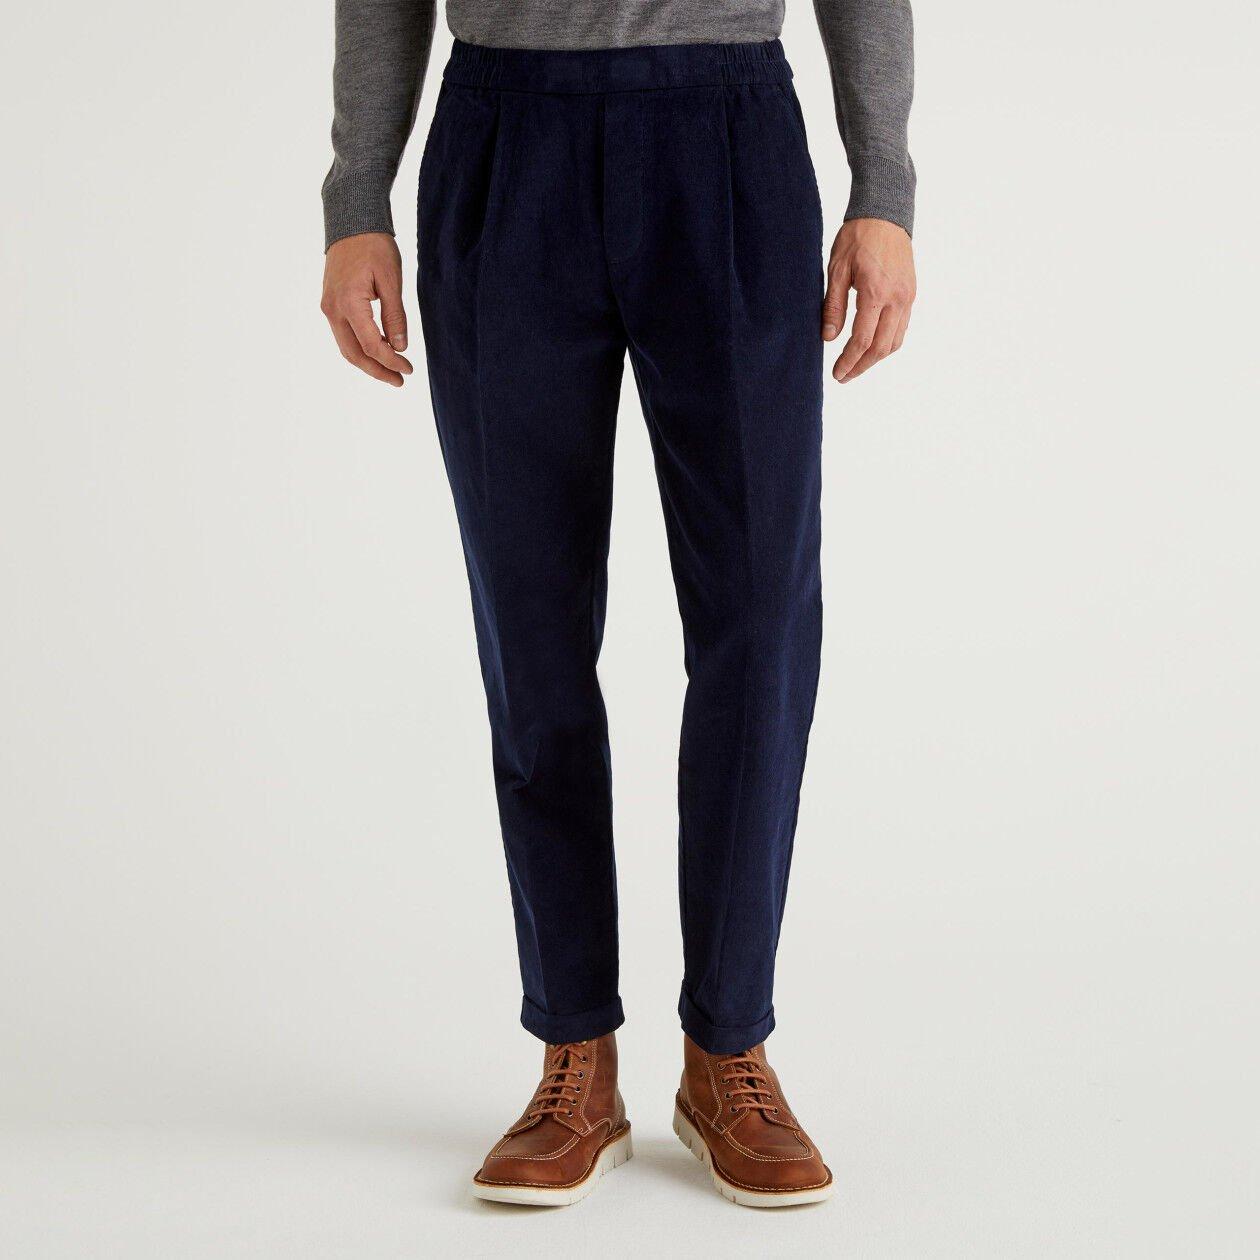 Pantalon en velours avec revers